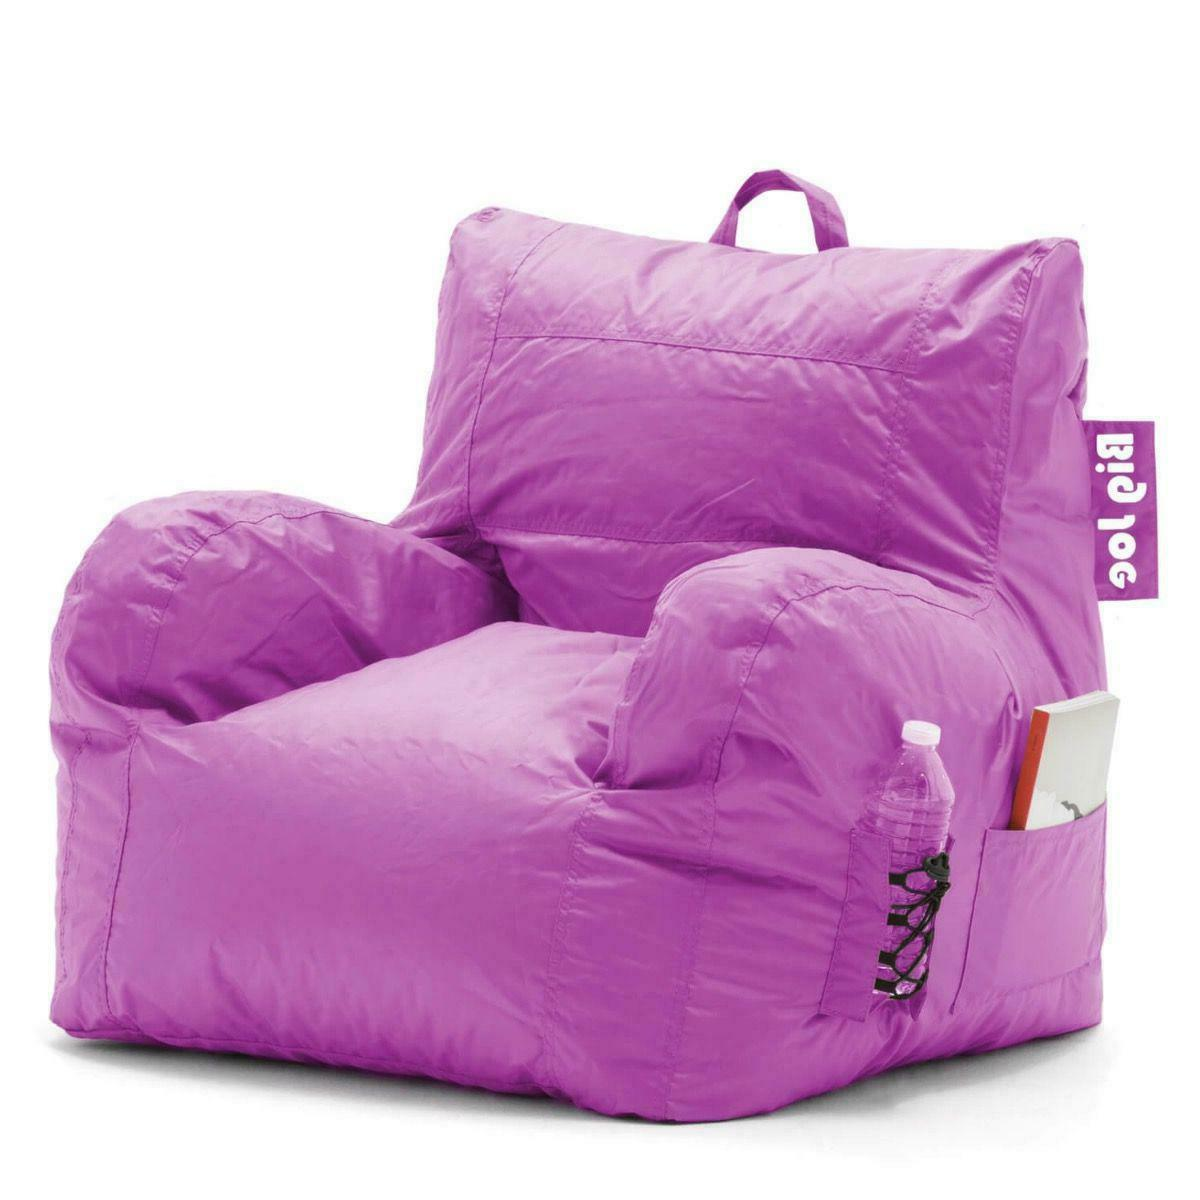 Big Joe Bag Chair Comfort Waterproof Sofa Kids Adults